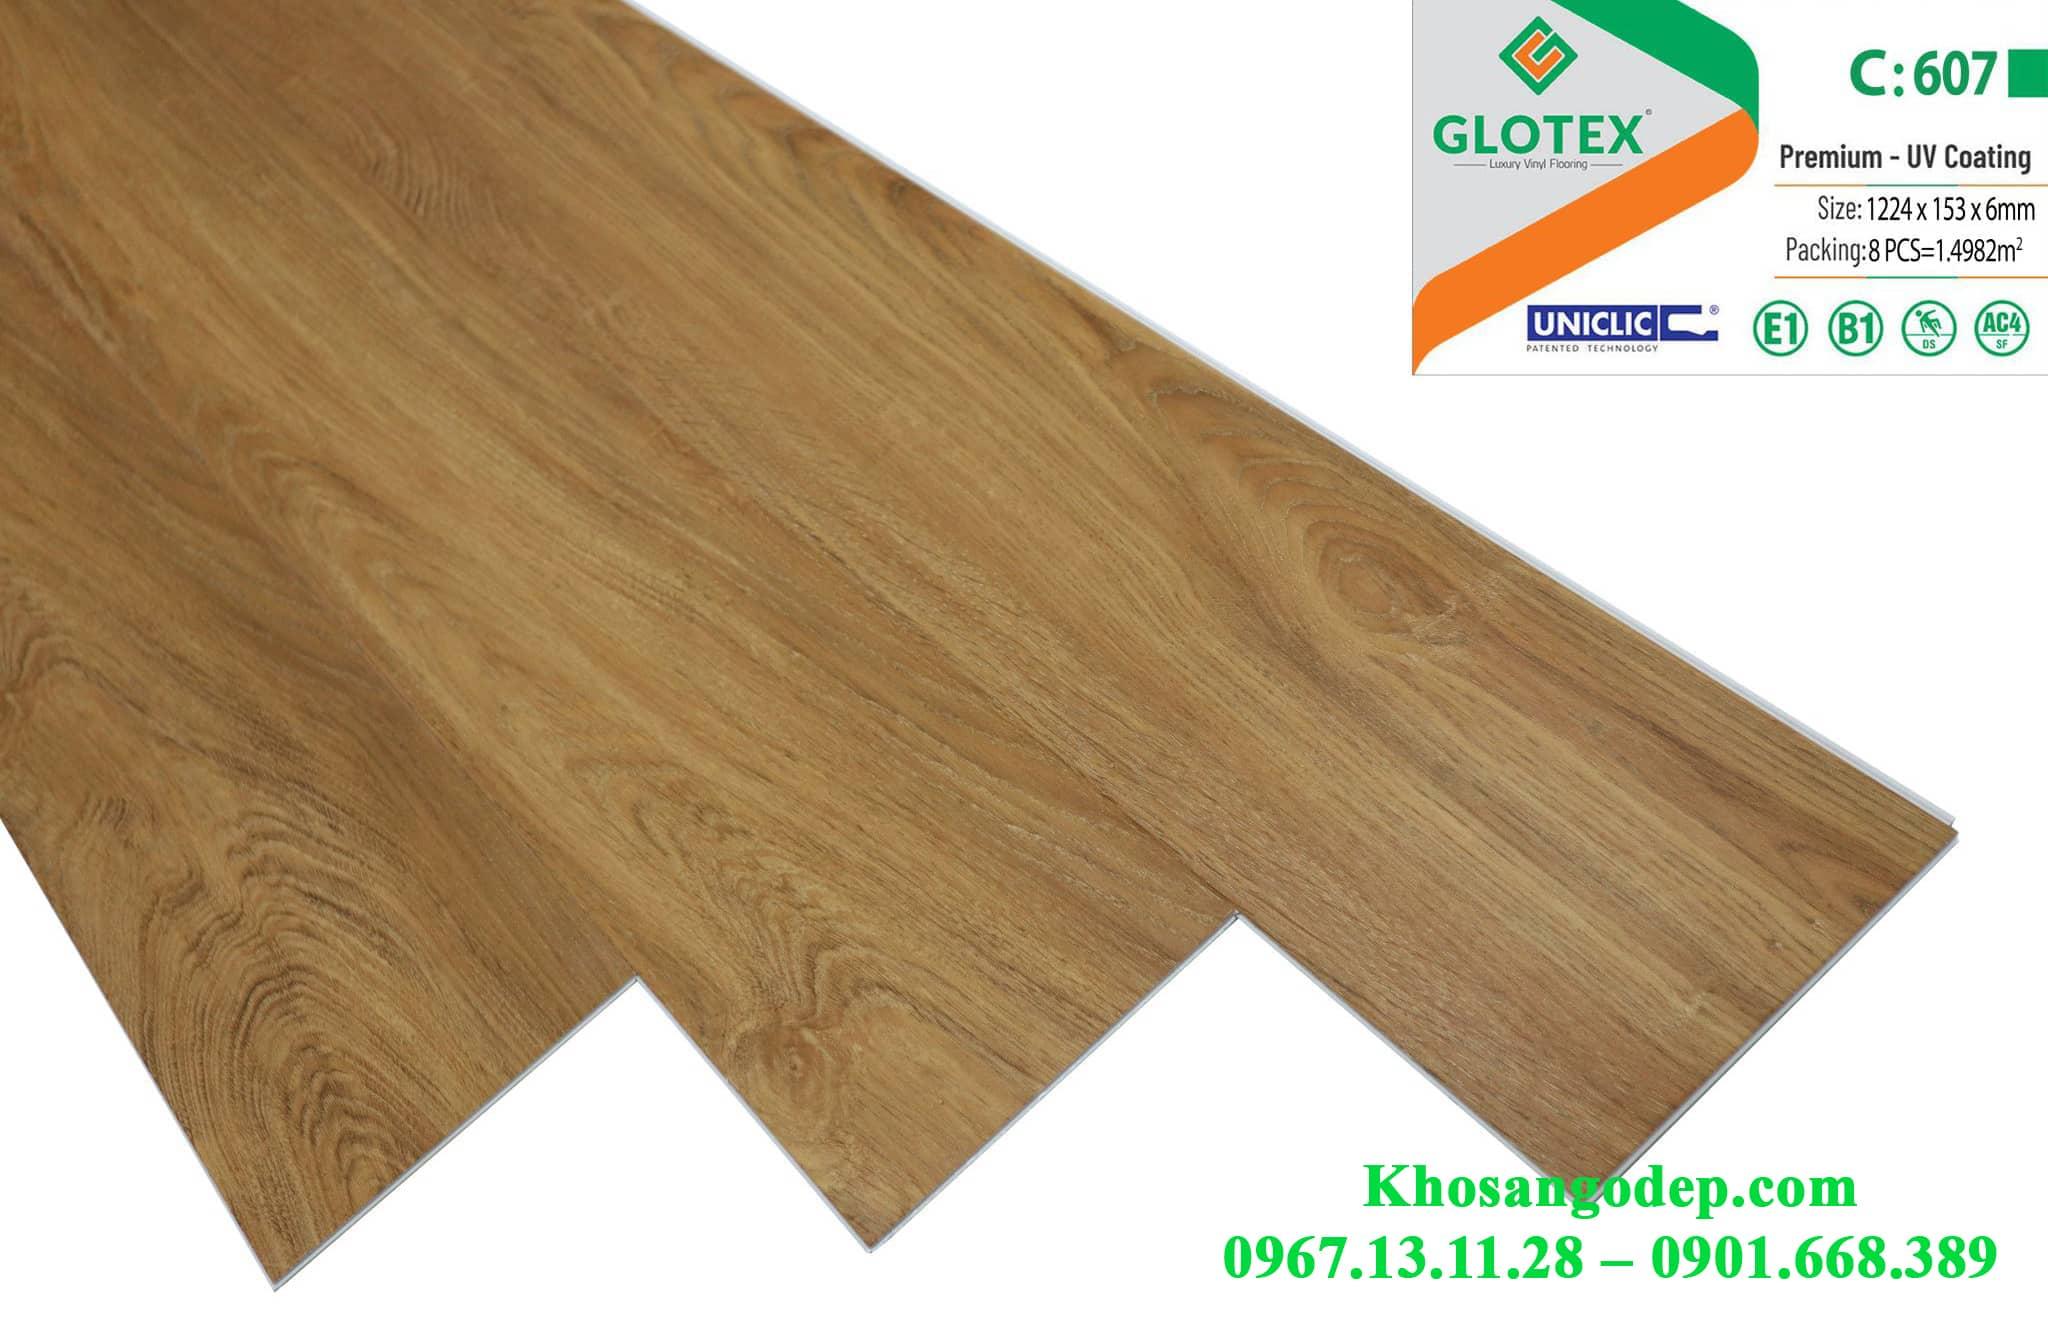 Sàn nhựa Glotex 6mm C607